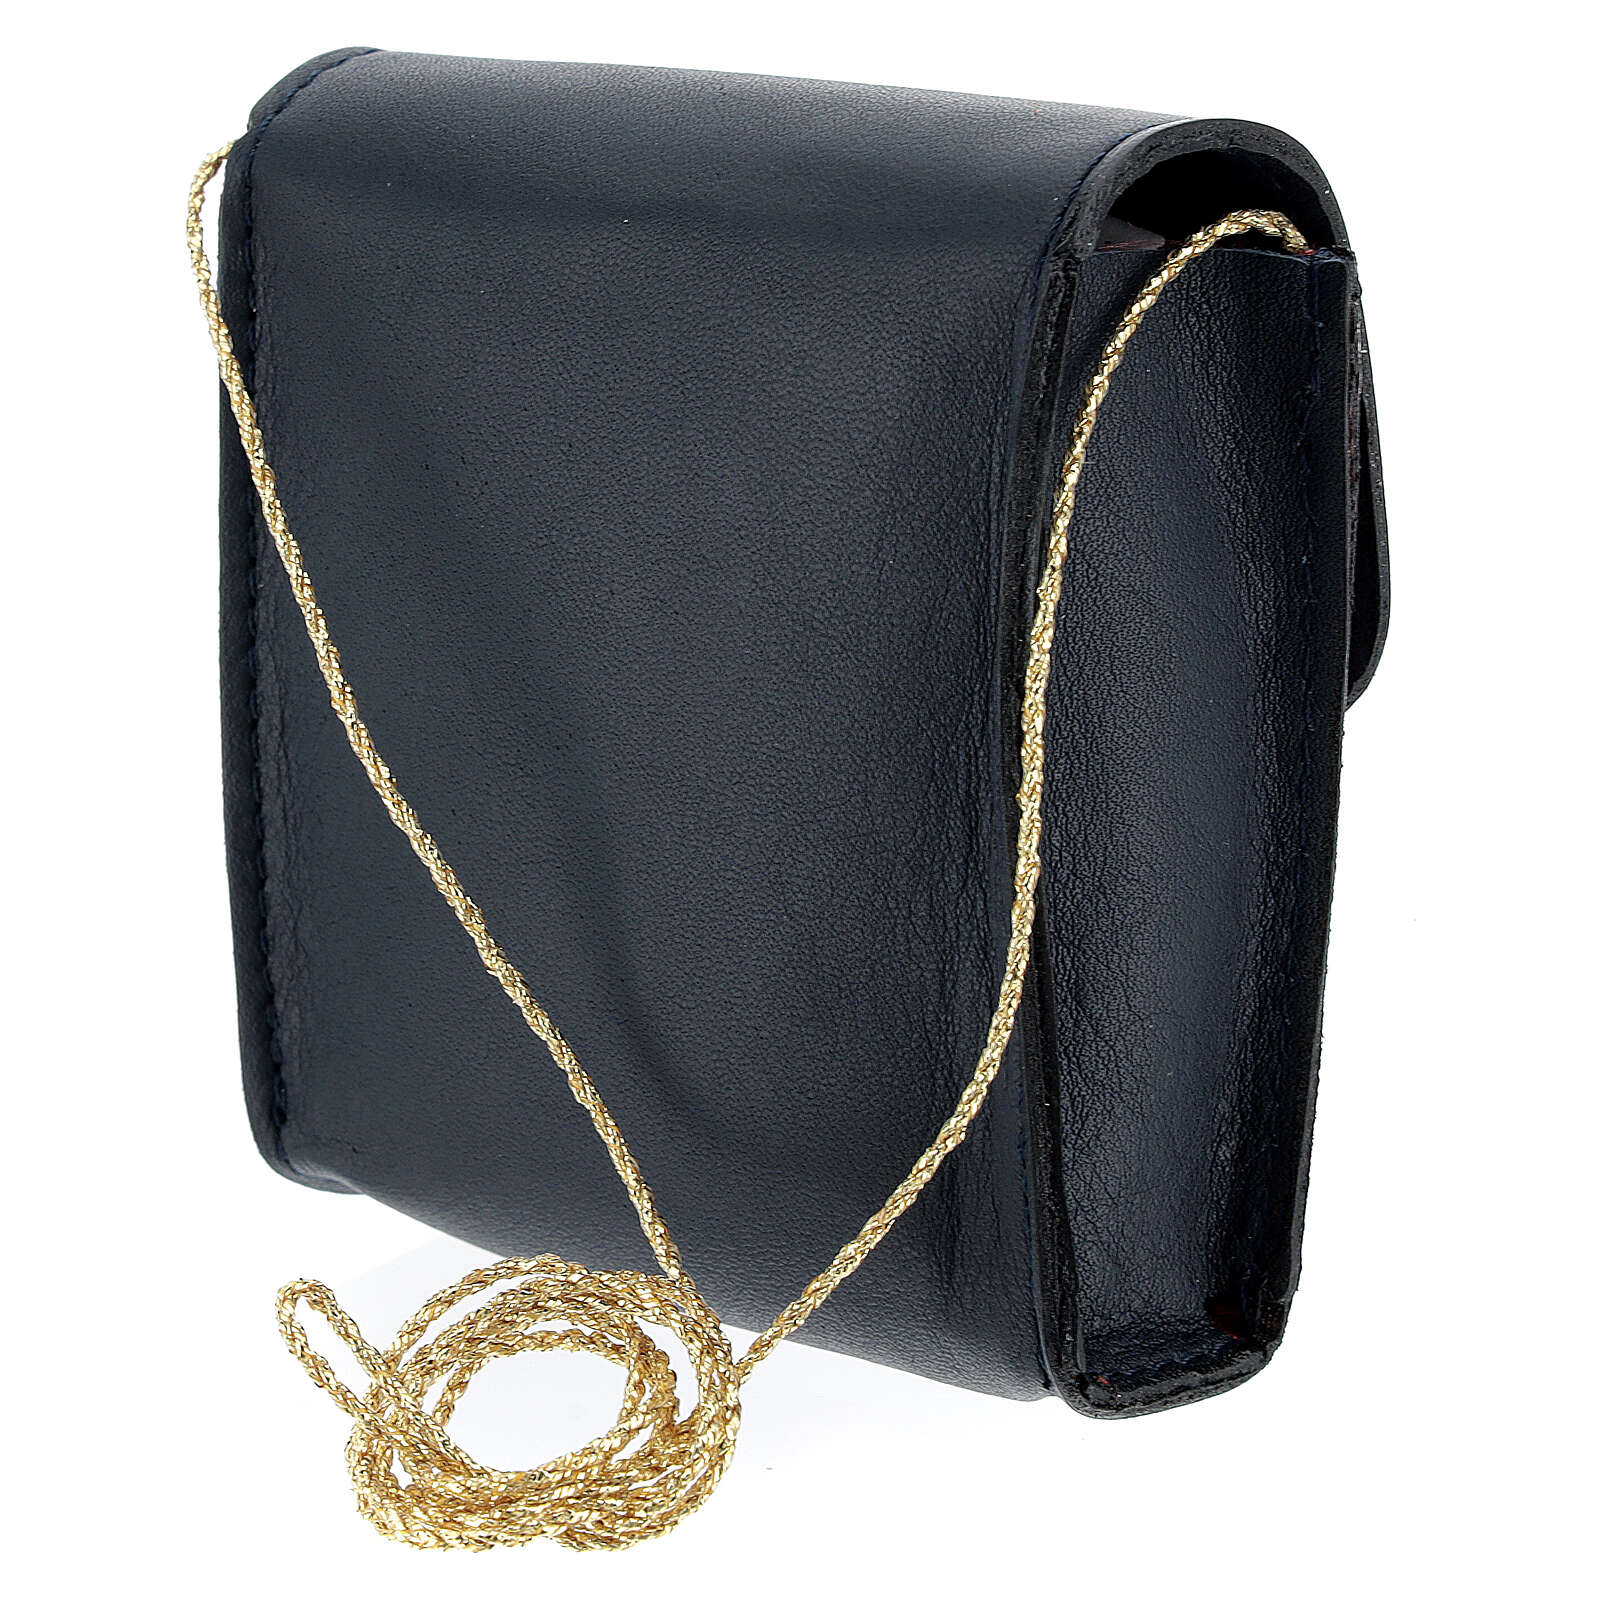 Paten case 9x9 cm in blue leather 4